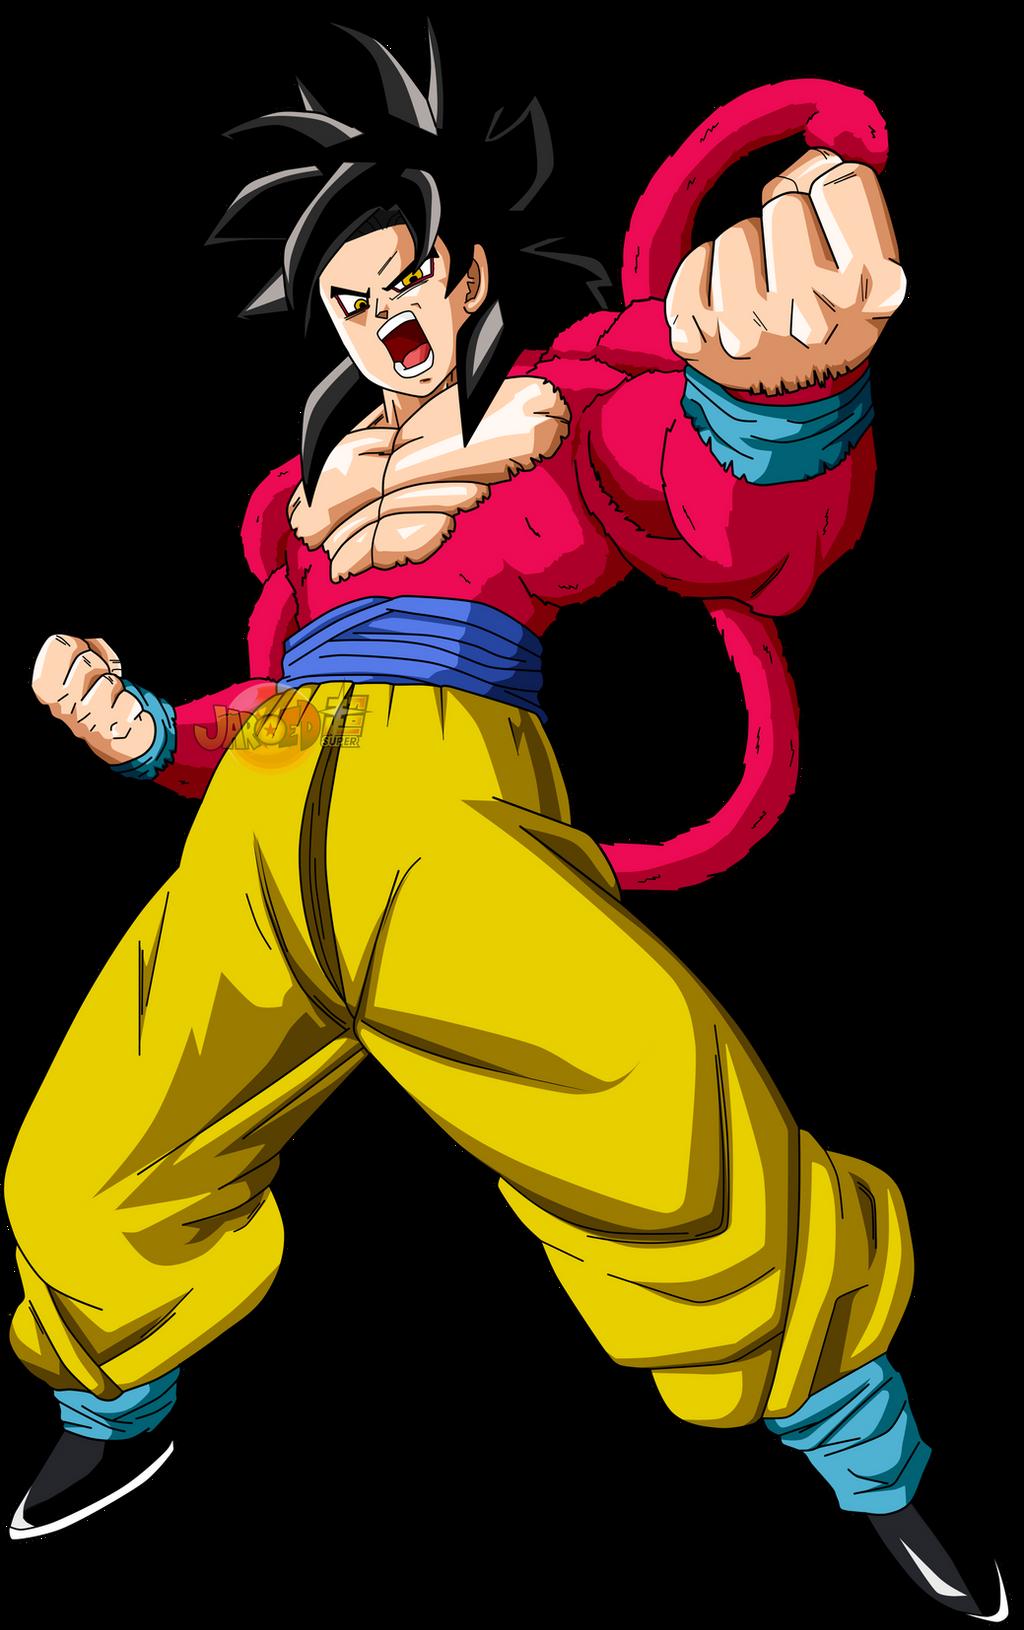 Ssj4 Goku And Vegeta Fusion | www.imgkid.com - The Image